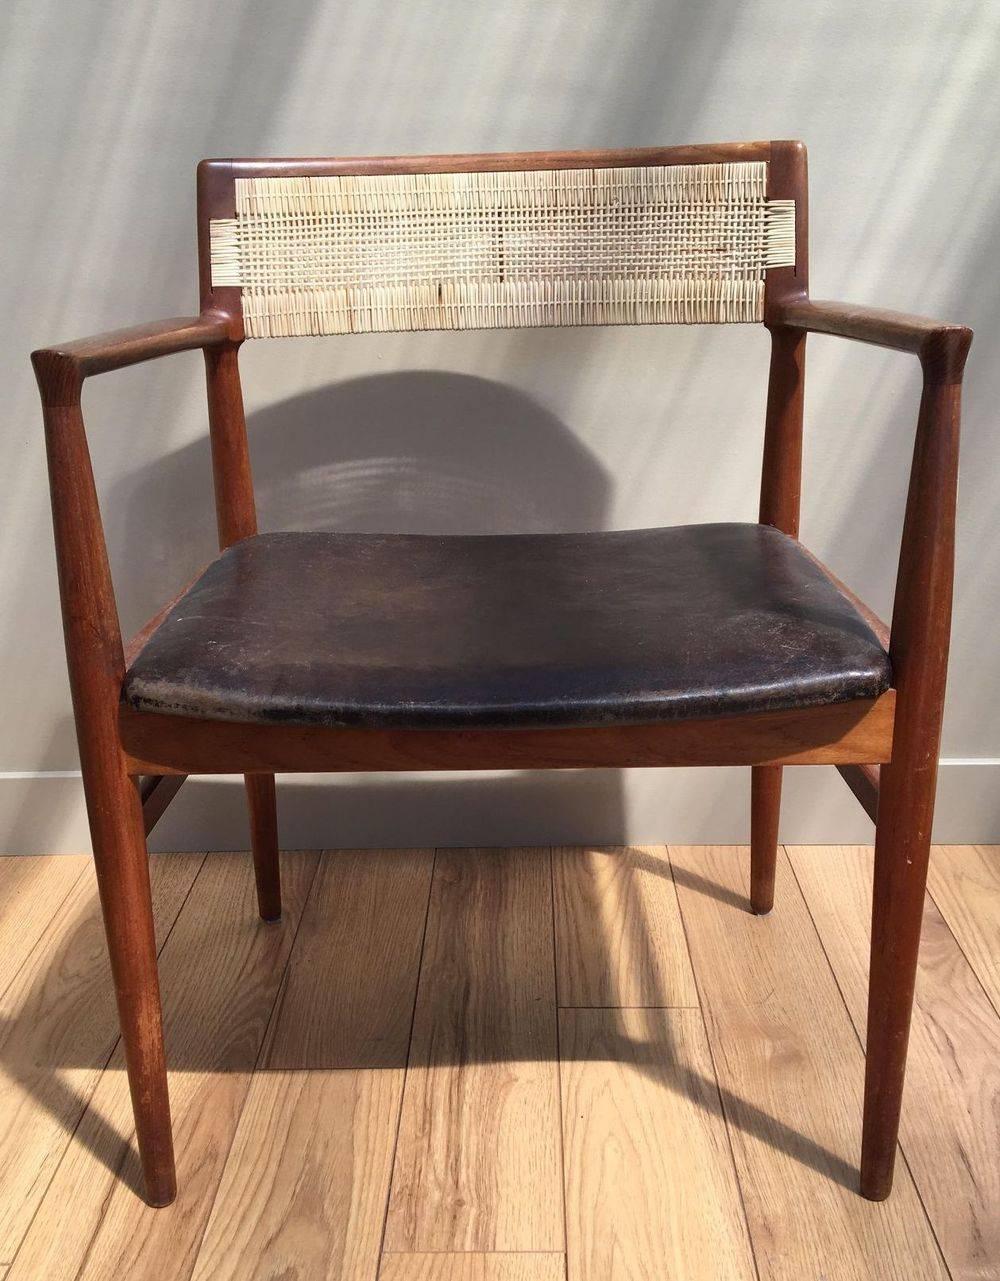 ERIK WØRTS caned back chair